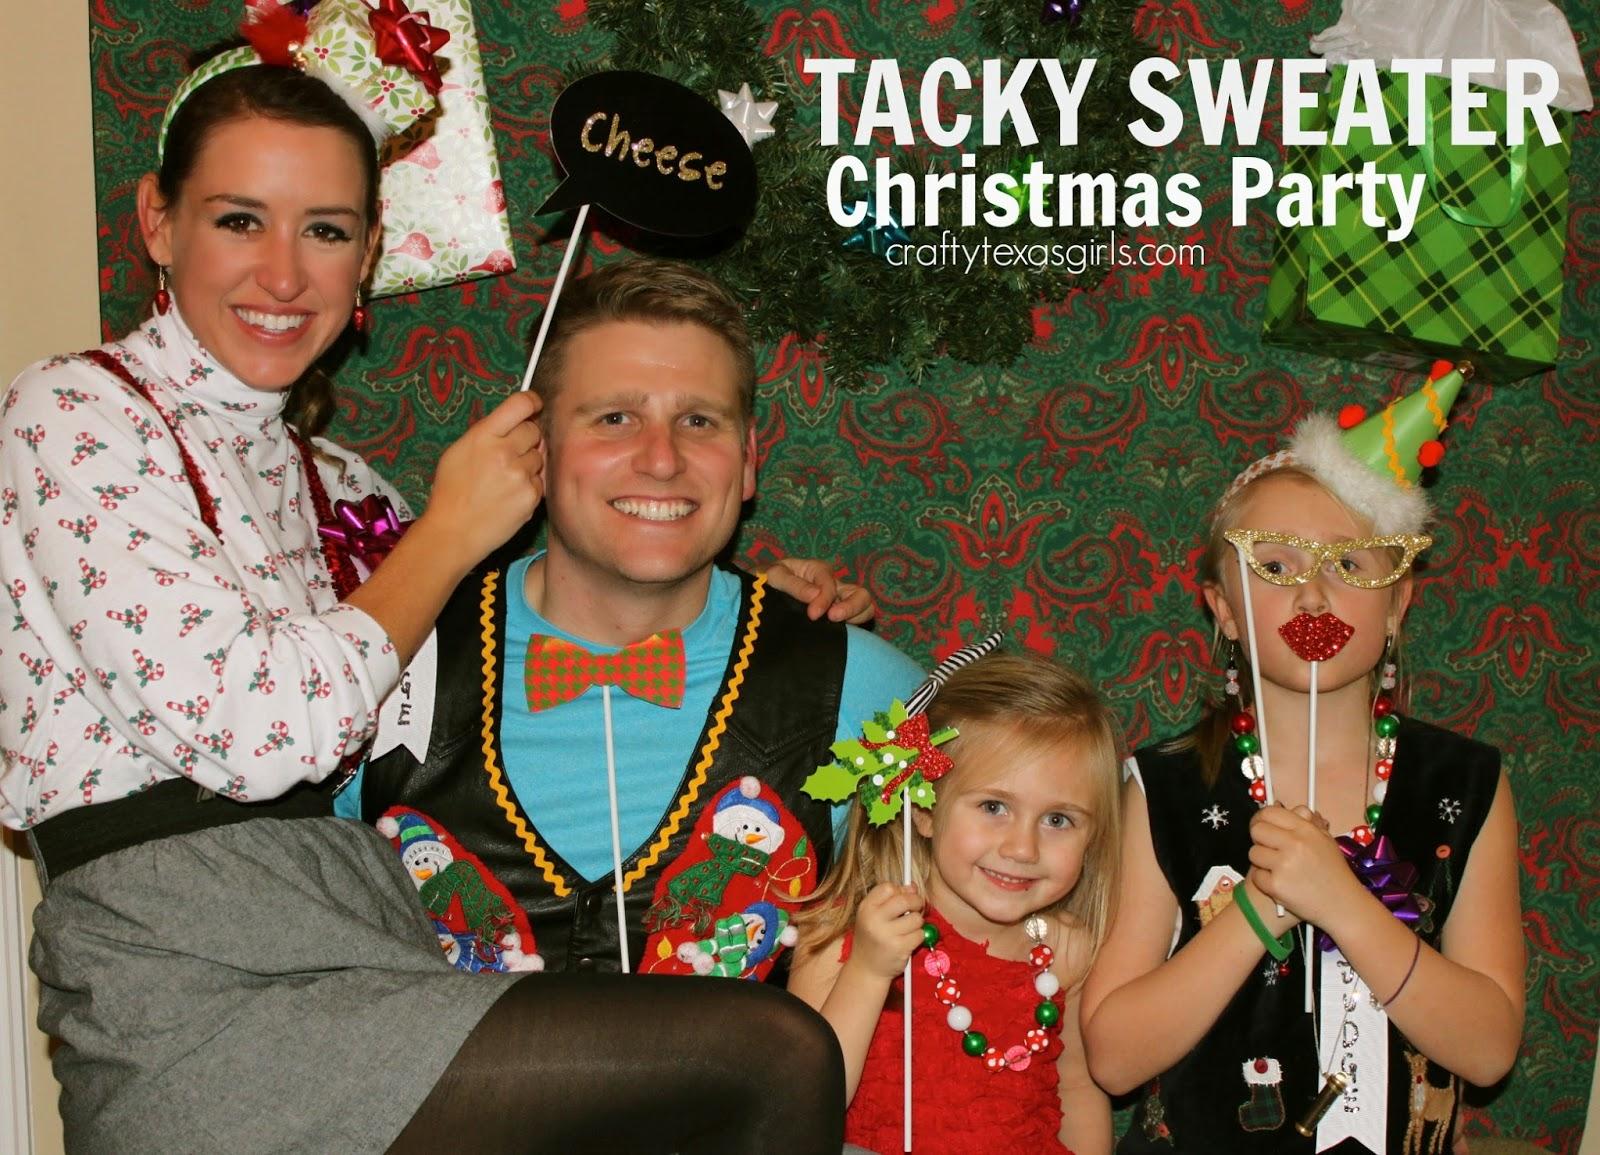 Crafty texas girls 2013 i solutioingenieria Choice Image